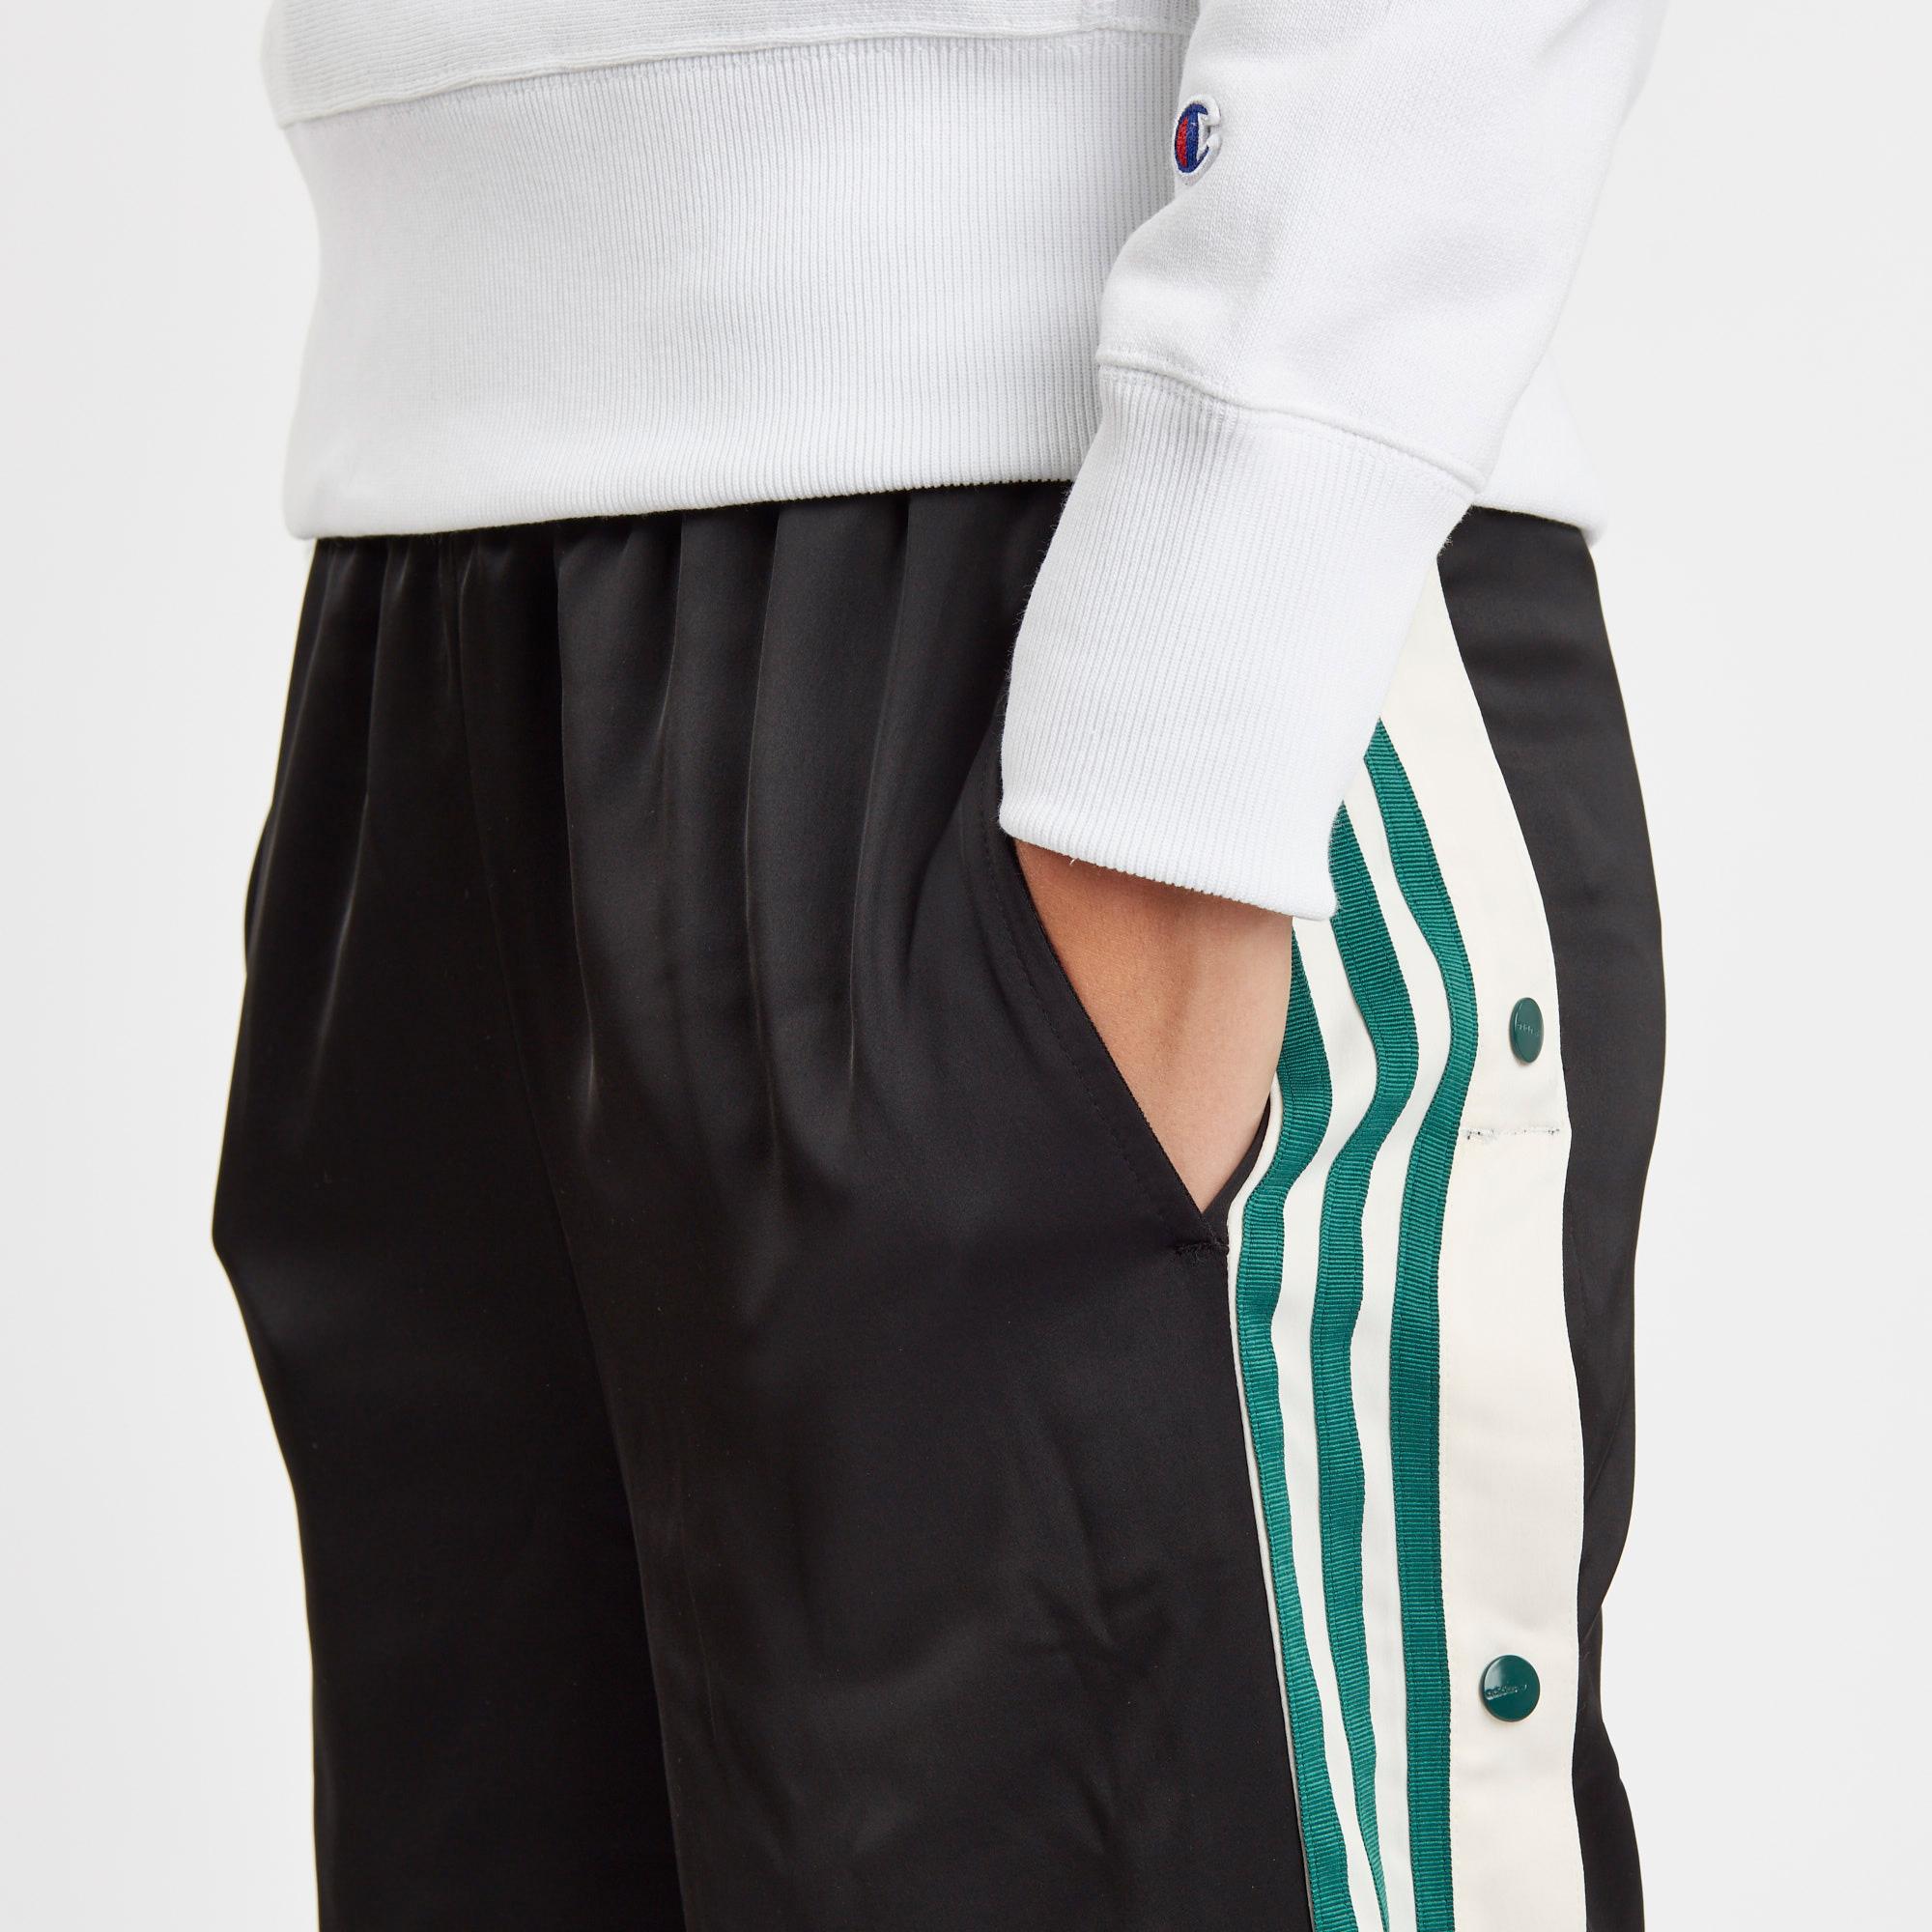 adidas OG Adibreak Track Pants Dh4602 Sneakersnstuff I